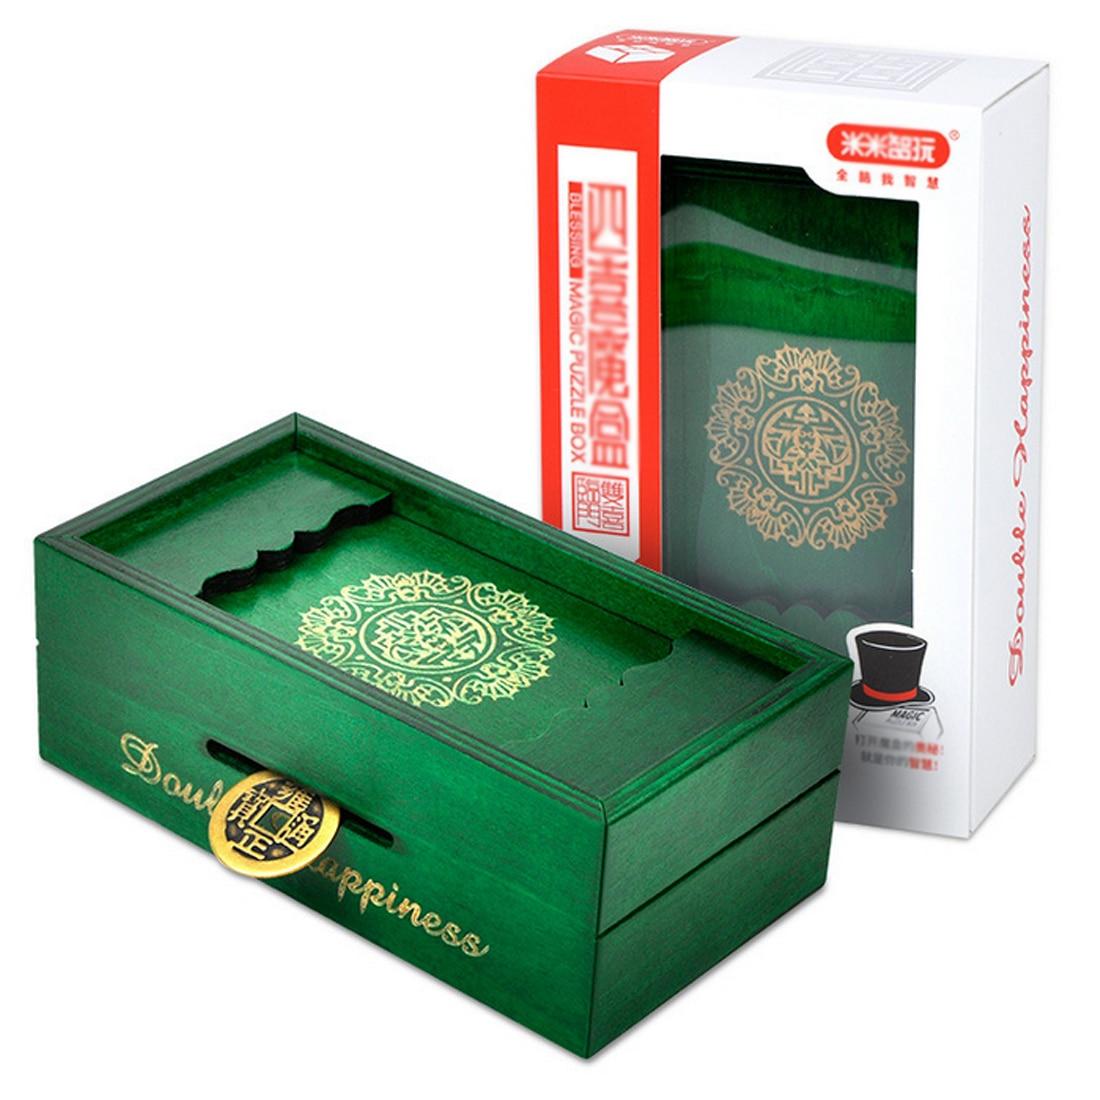 Wooden Puzzle Box Secret Trick Intelligence Compartment Magic Money Gift Brain Teaser Logic Educational Toy